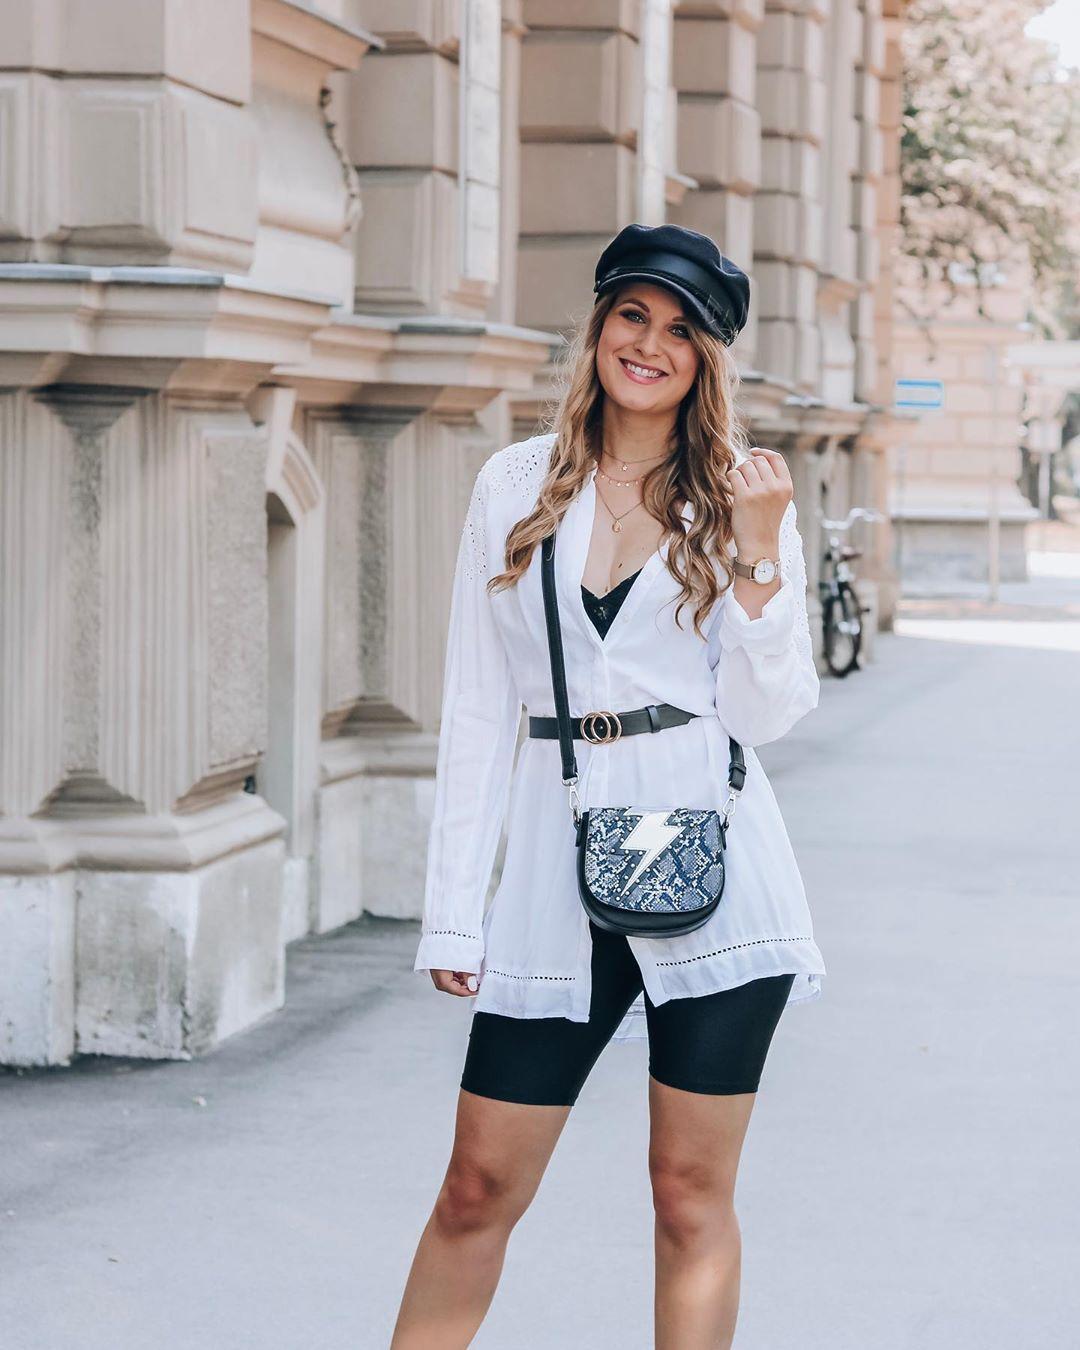 PHOTO VIA: @fashionladyloves.